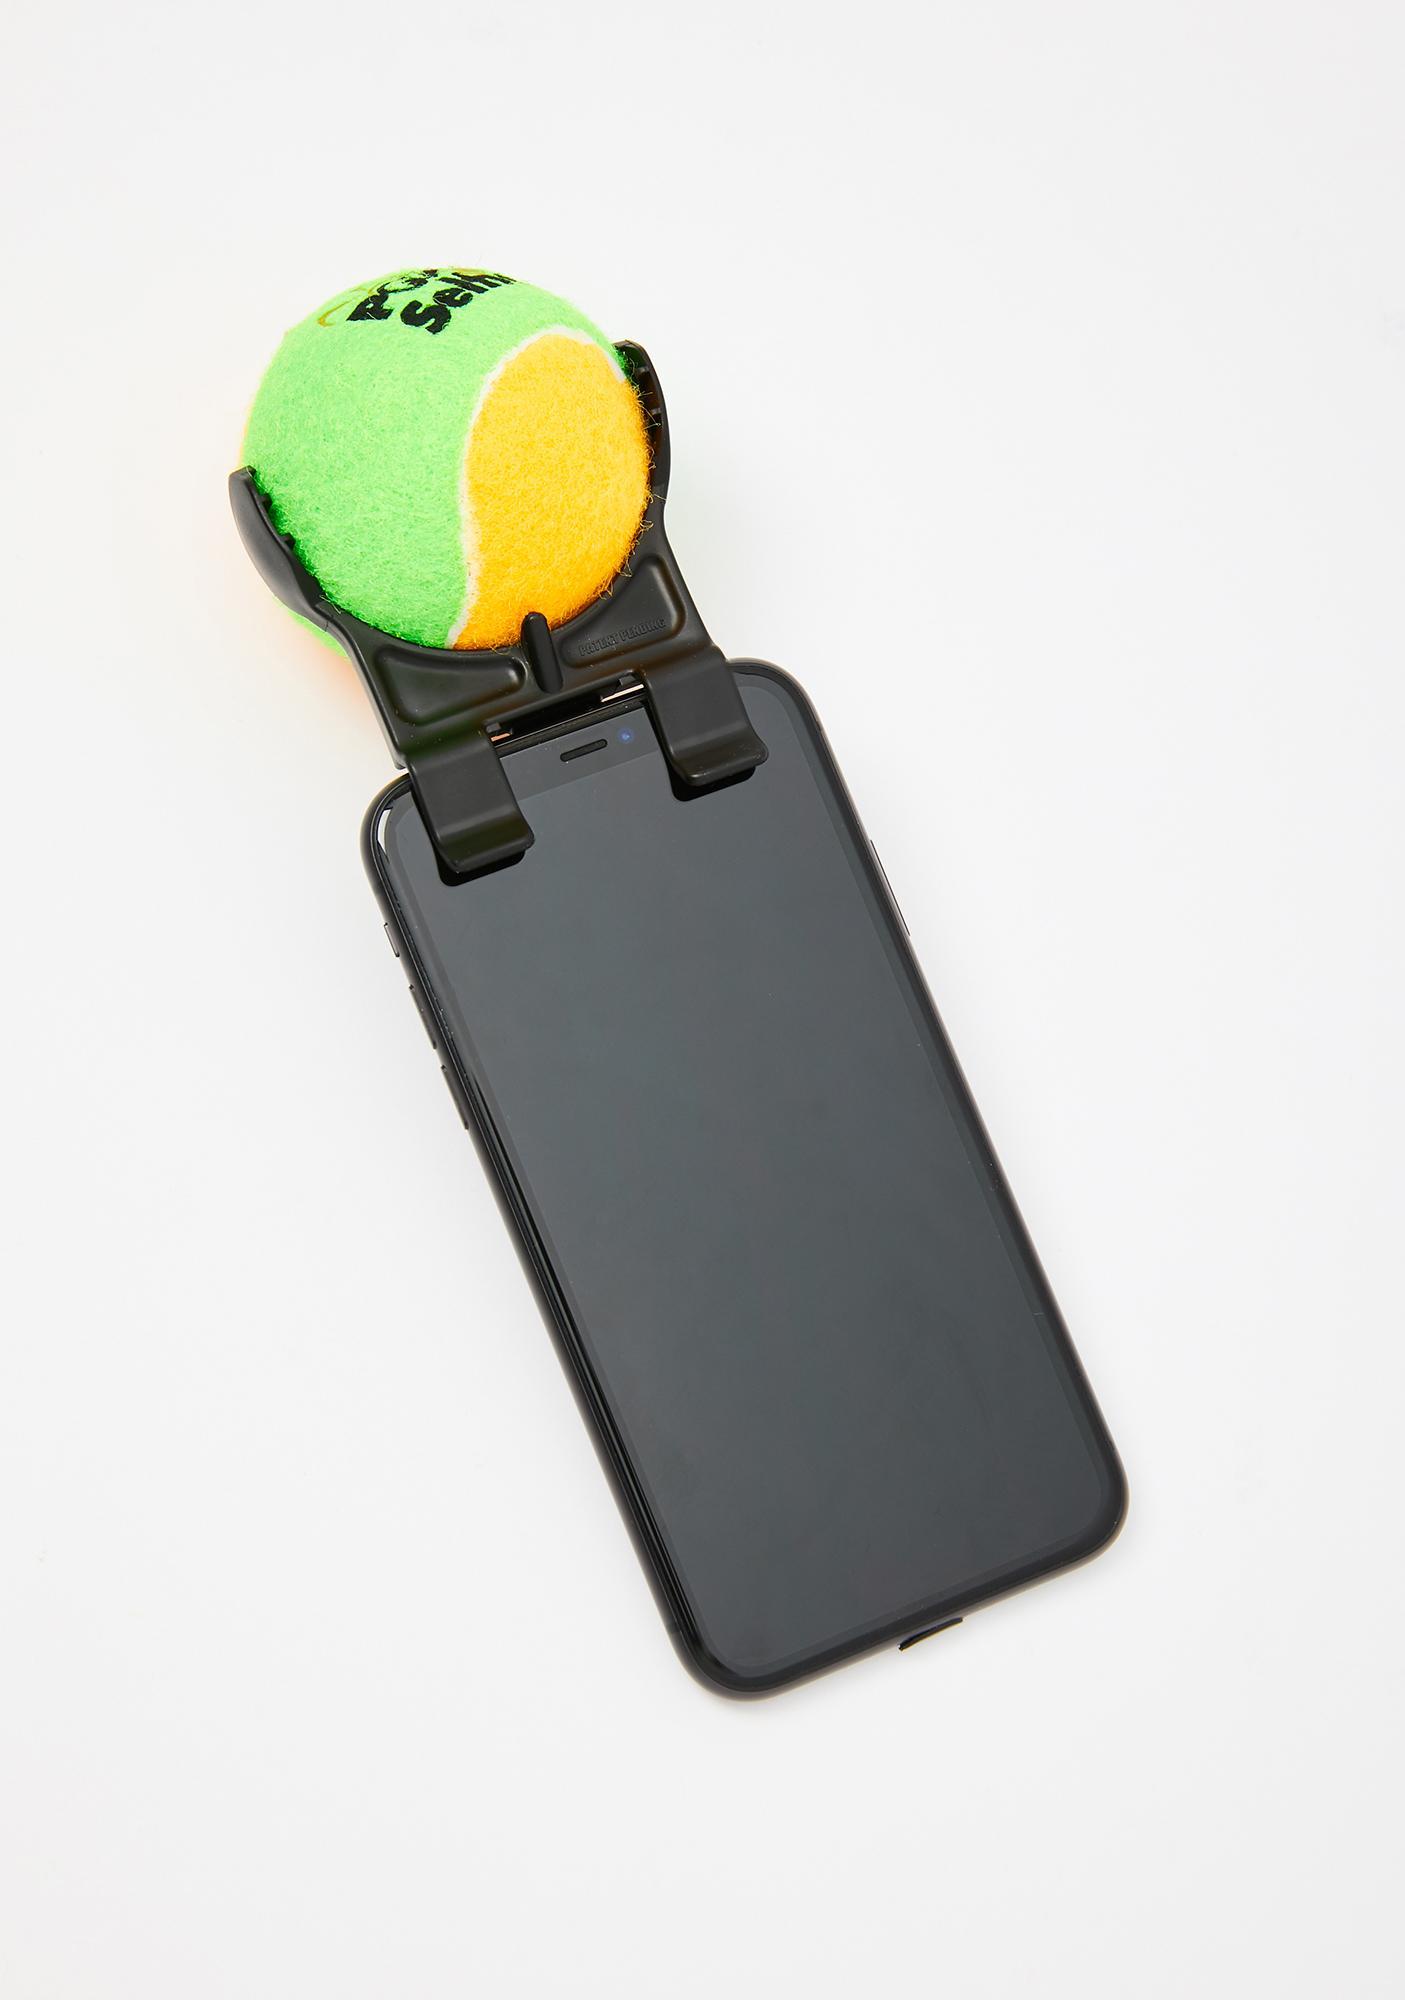 Pooch Pix Camera Accessory